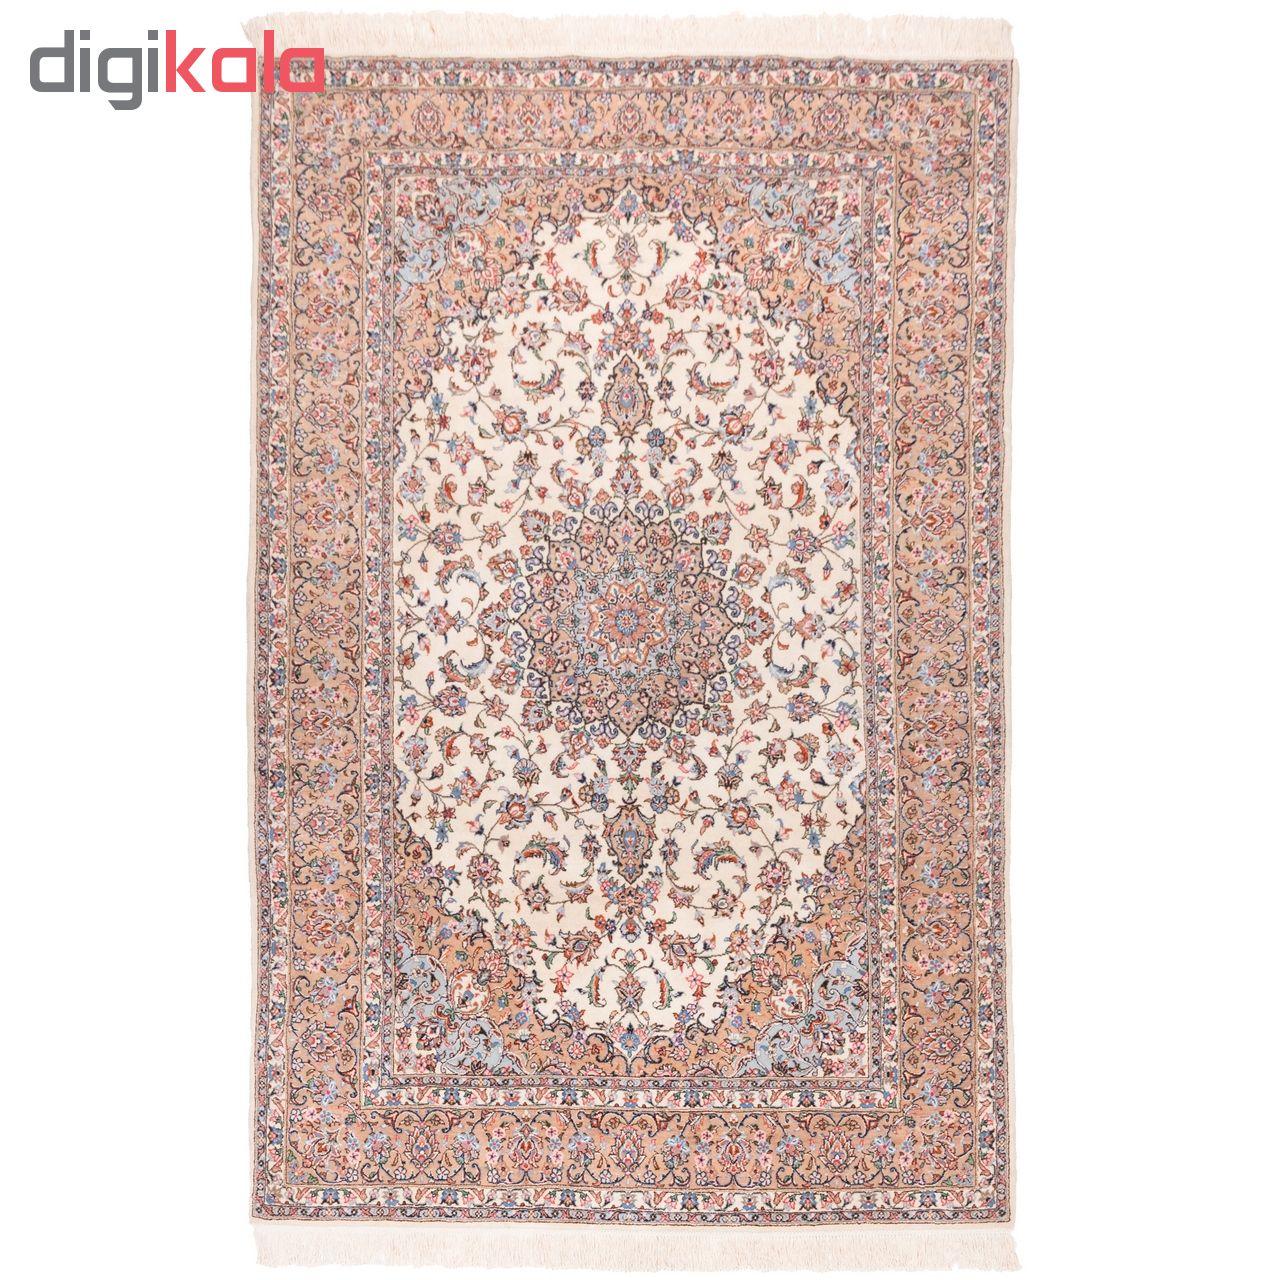 فرش دستباف شش متری سی پرشیا کد 174143